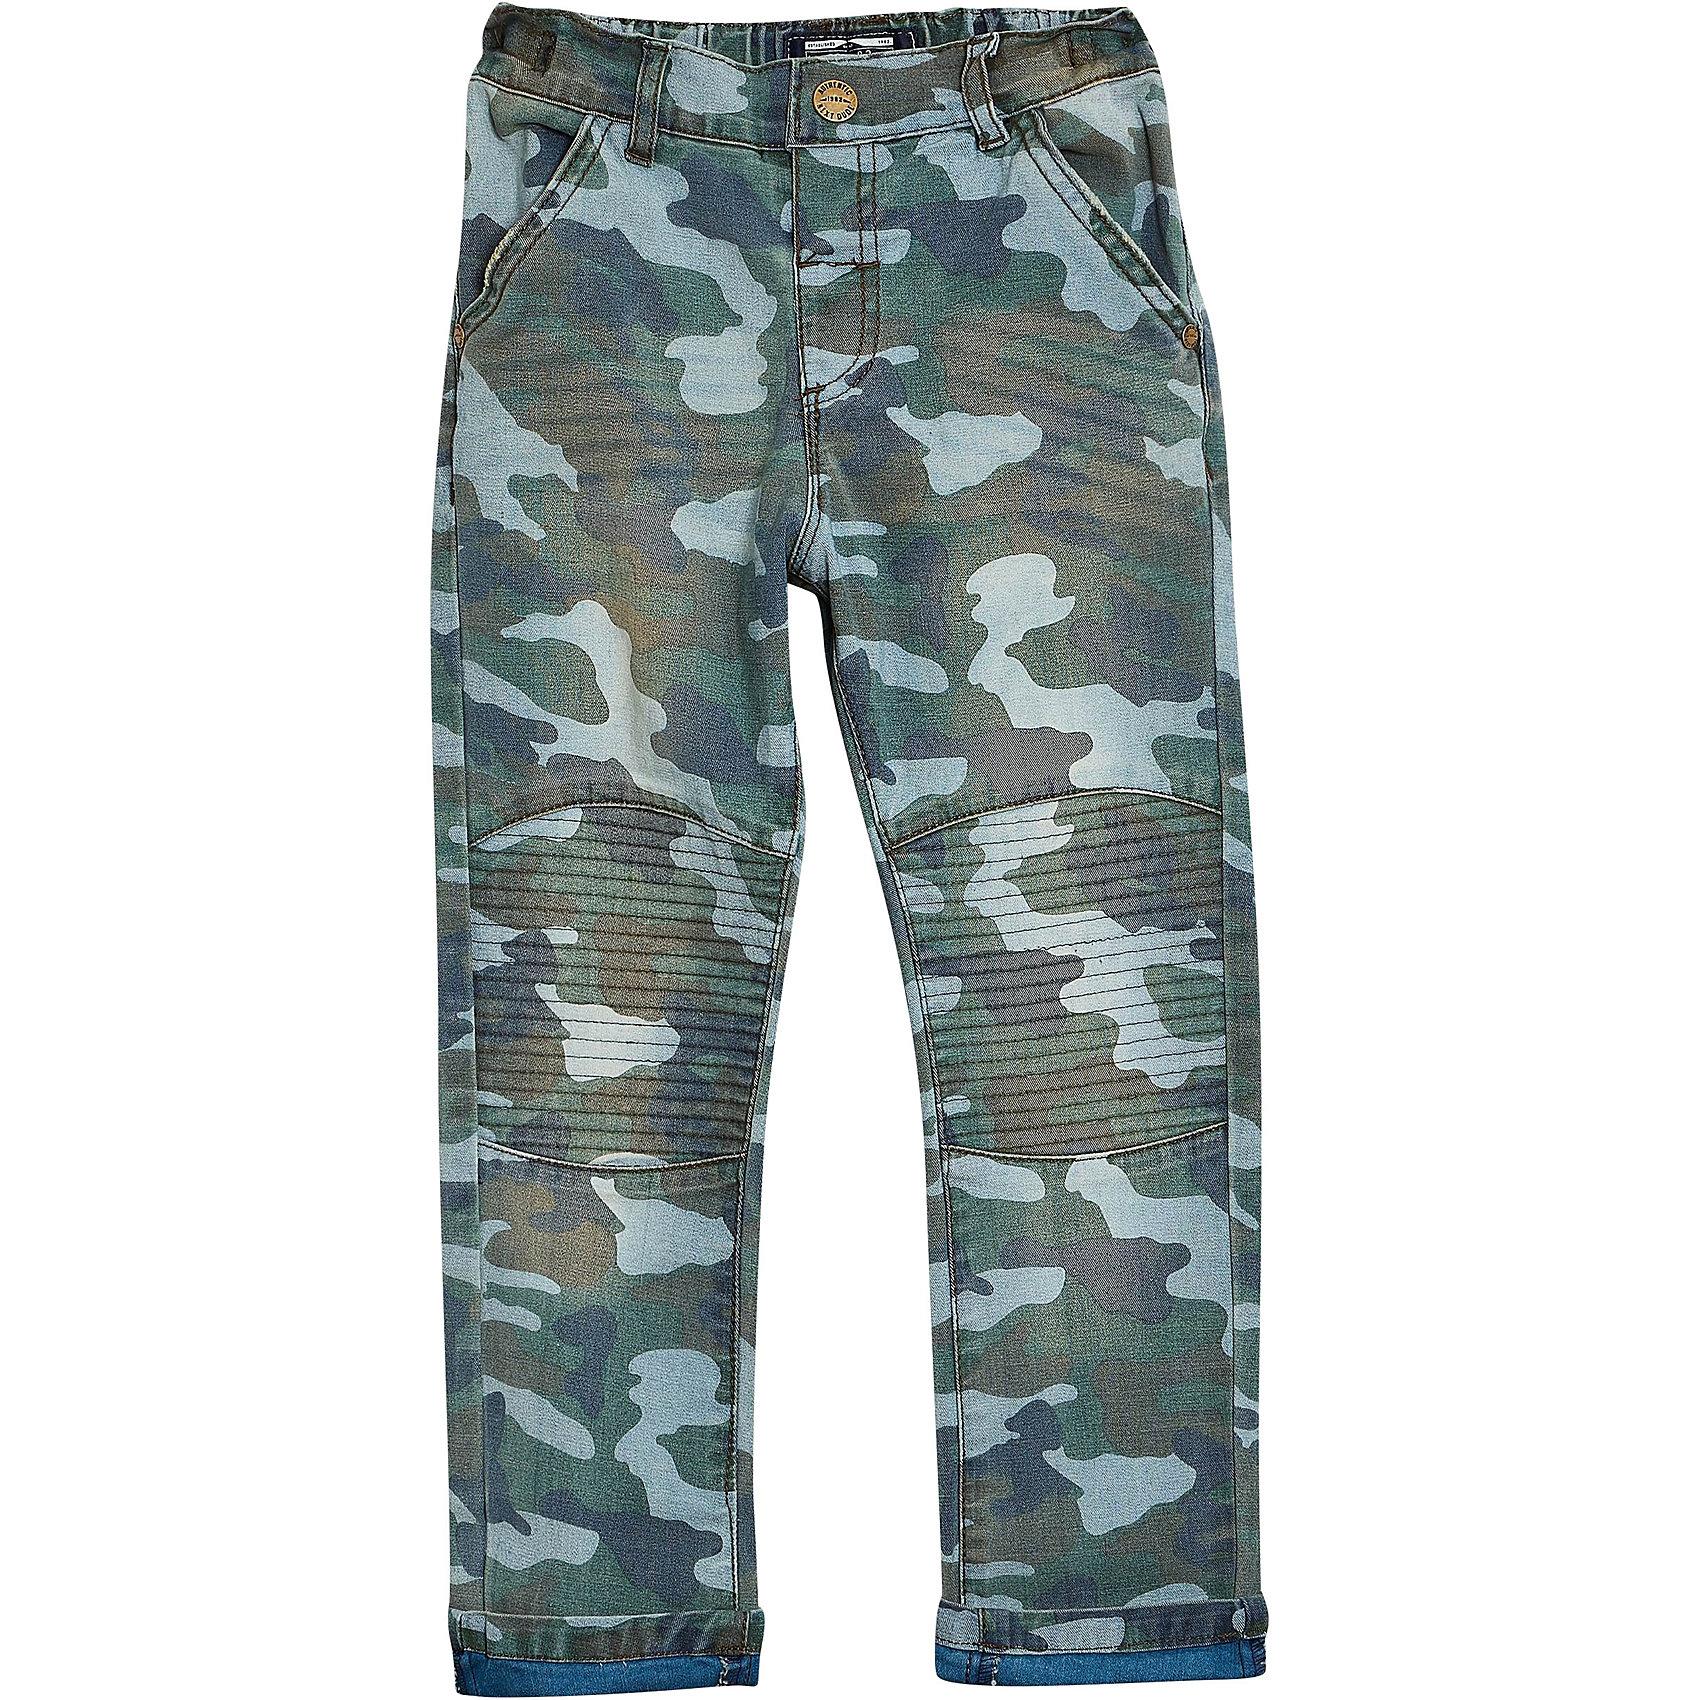 neu next jeans mit camouflage muster fuer jungen - Jeans Mit Muster